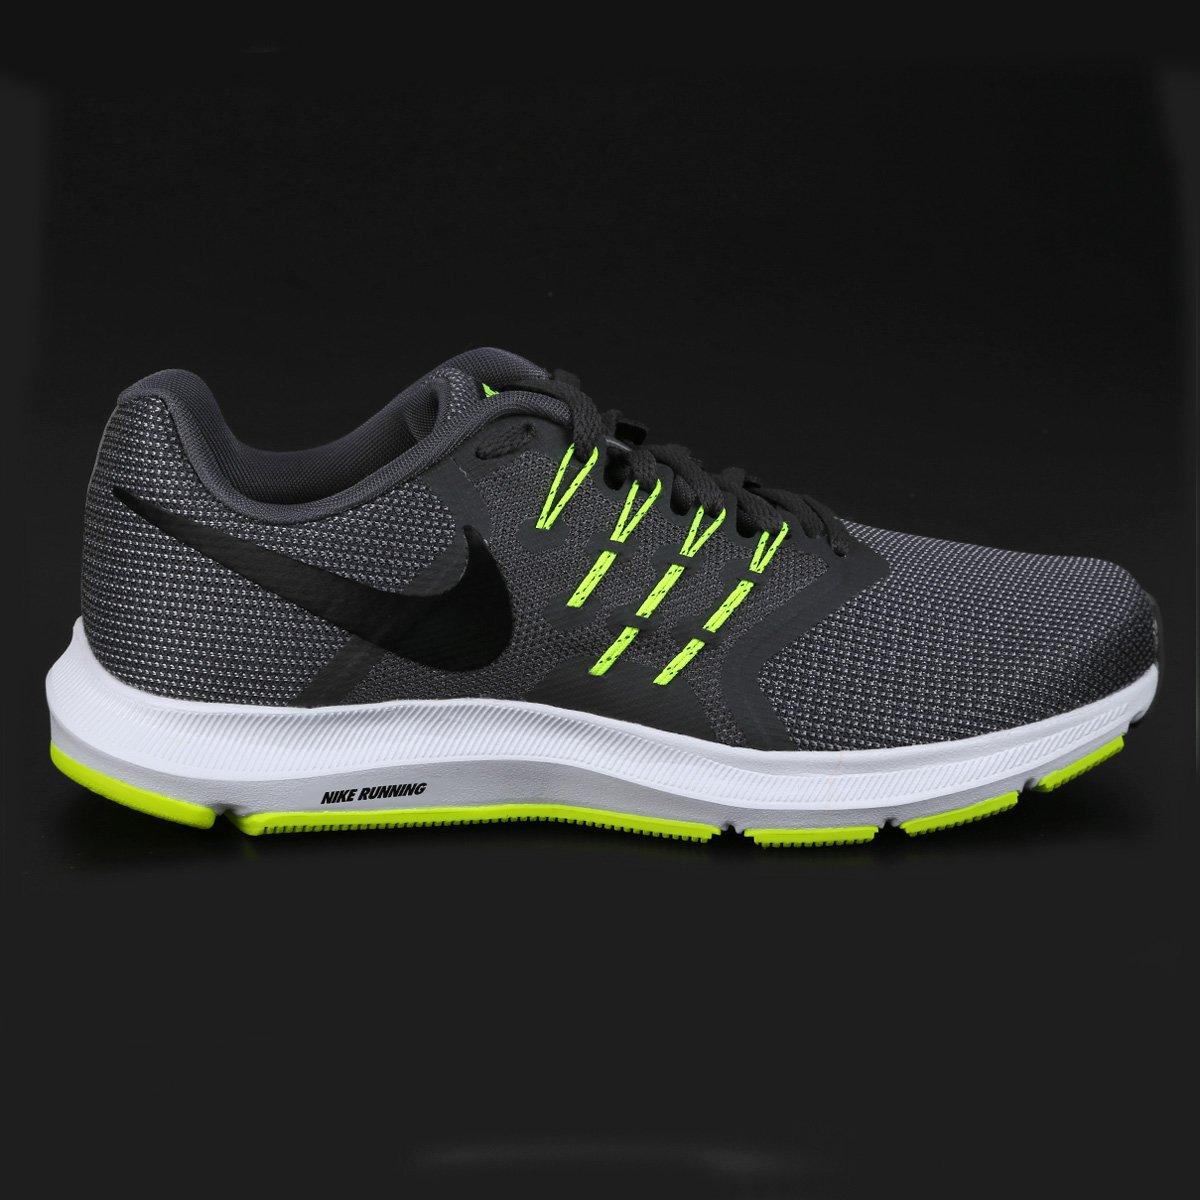 Tênis Nike Run Swift Shop Masculino Compre Agora Shop Swift Timão 5e9a48 c38a4ce76c6e3